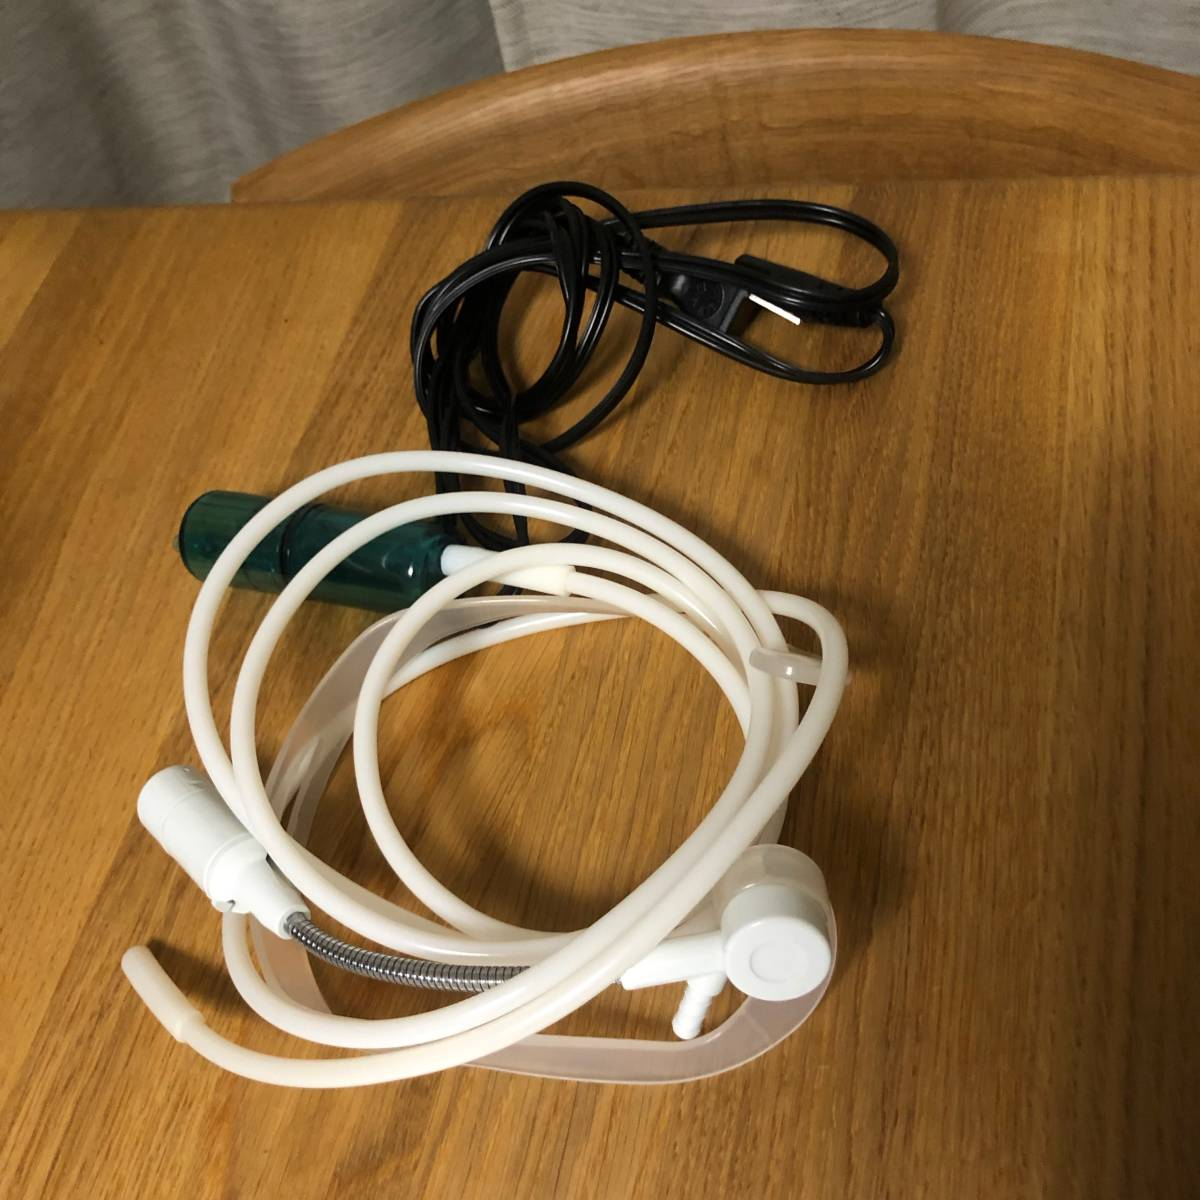 高濃度酸素発生器 M1O2-Hybrid 美品 定価248000円 高評価の酸素発生器です。_画像7